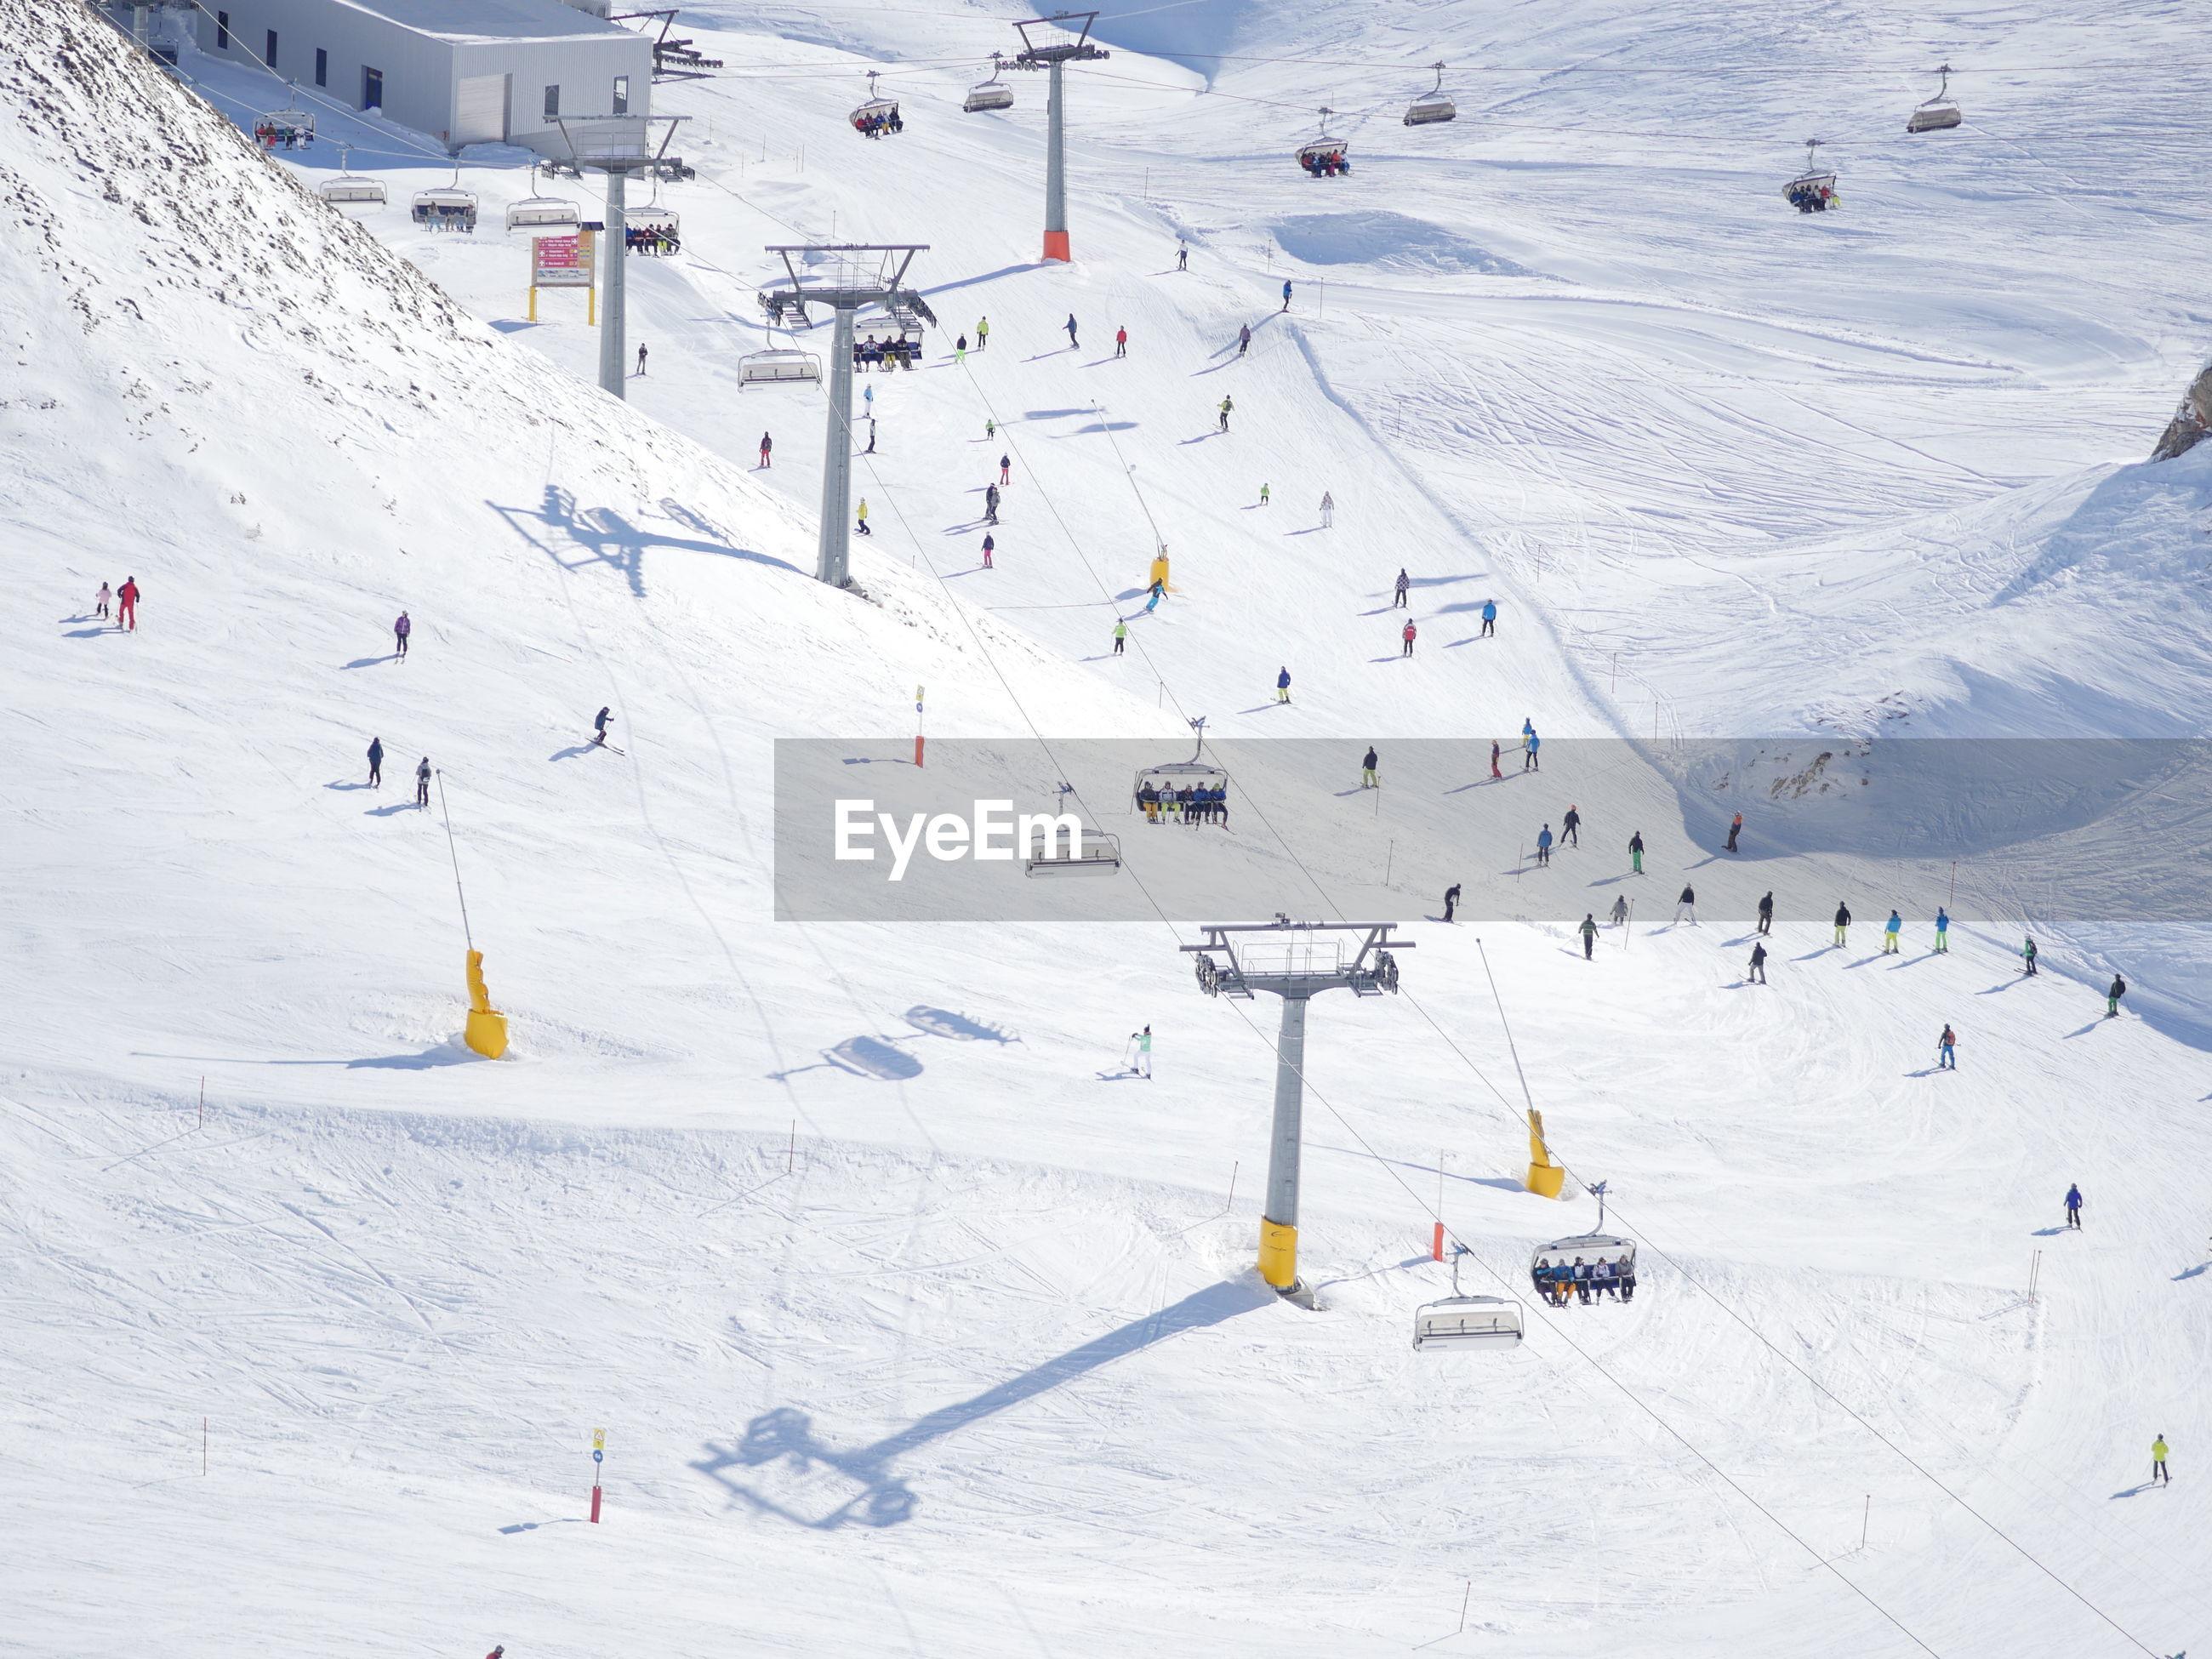 Tourists and ski lifts at ski resort